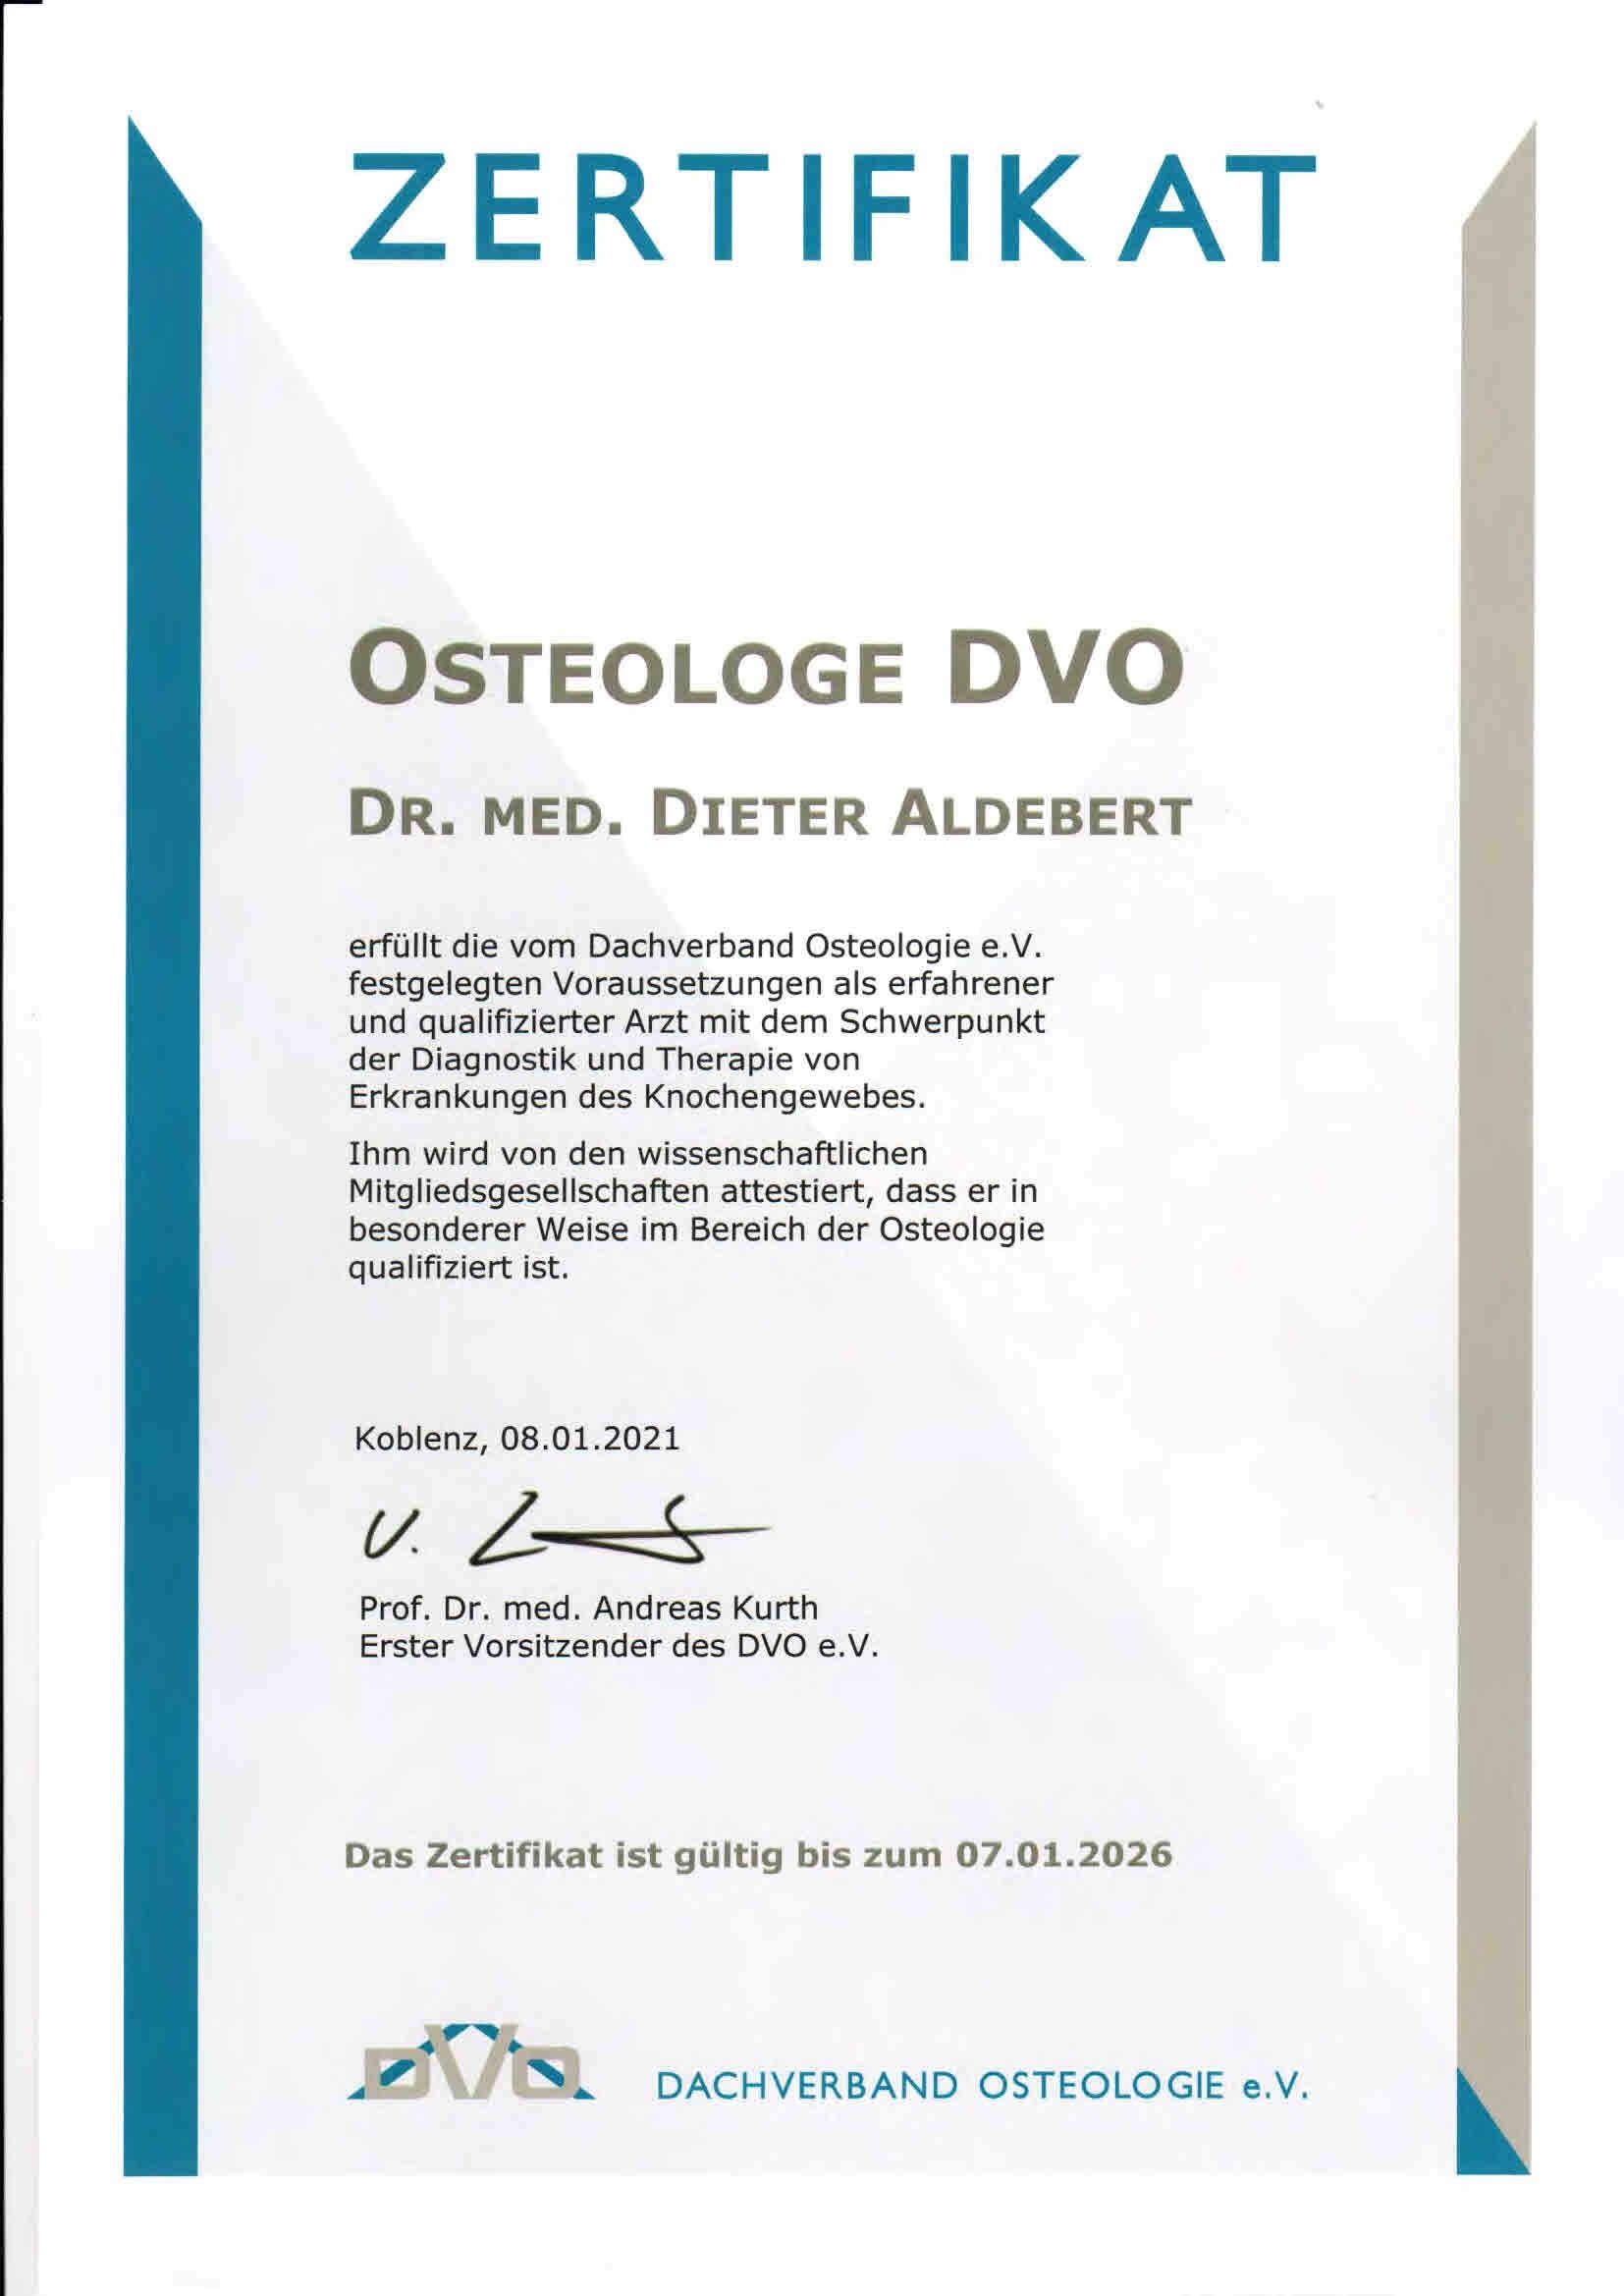 Osteologie Zertifikat